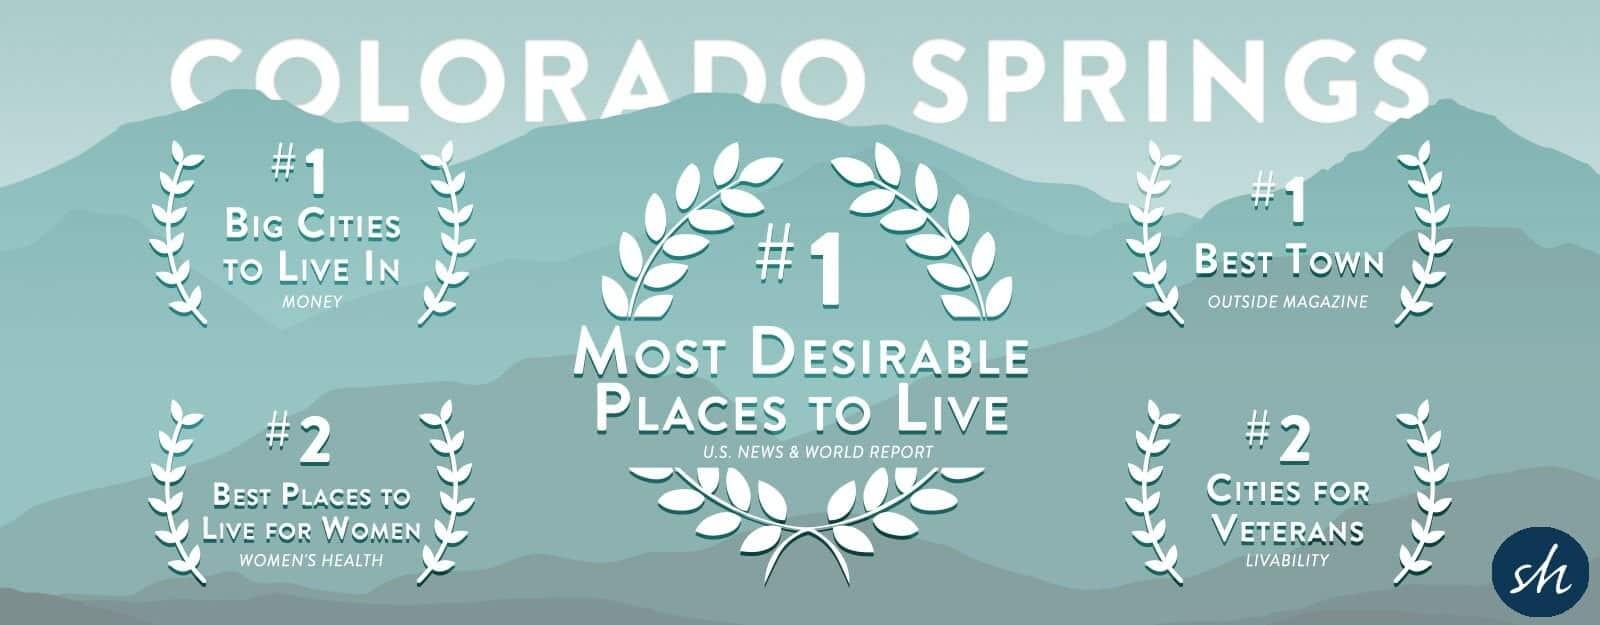 City of Colorado Springs Awards